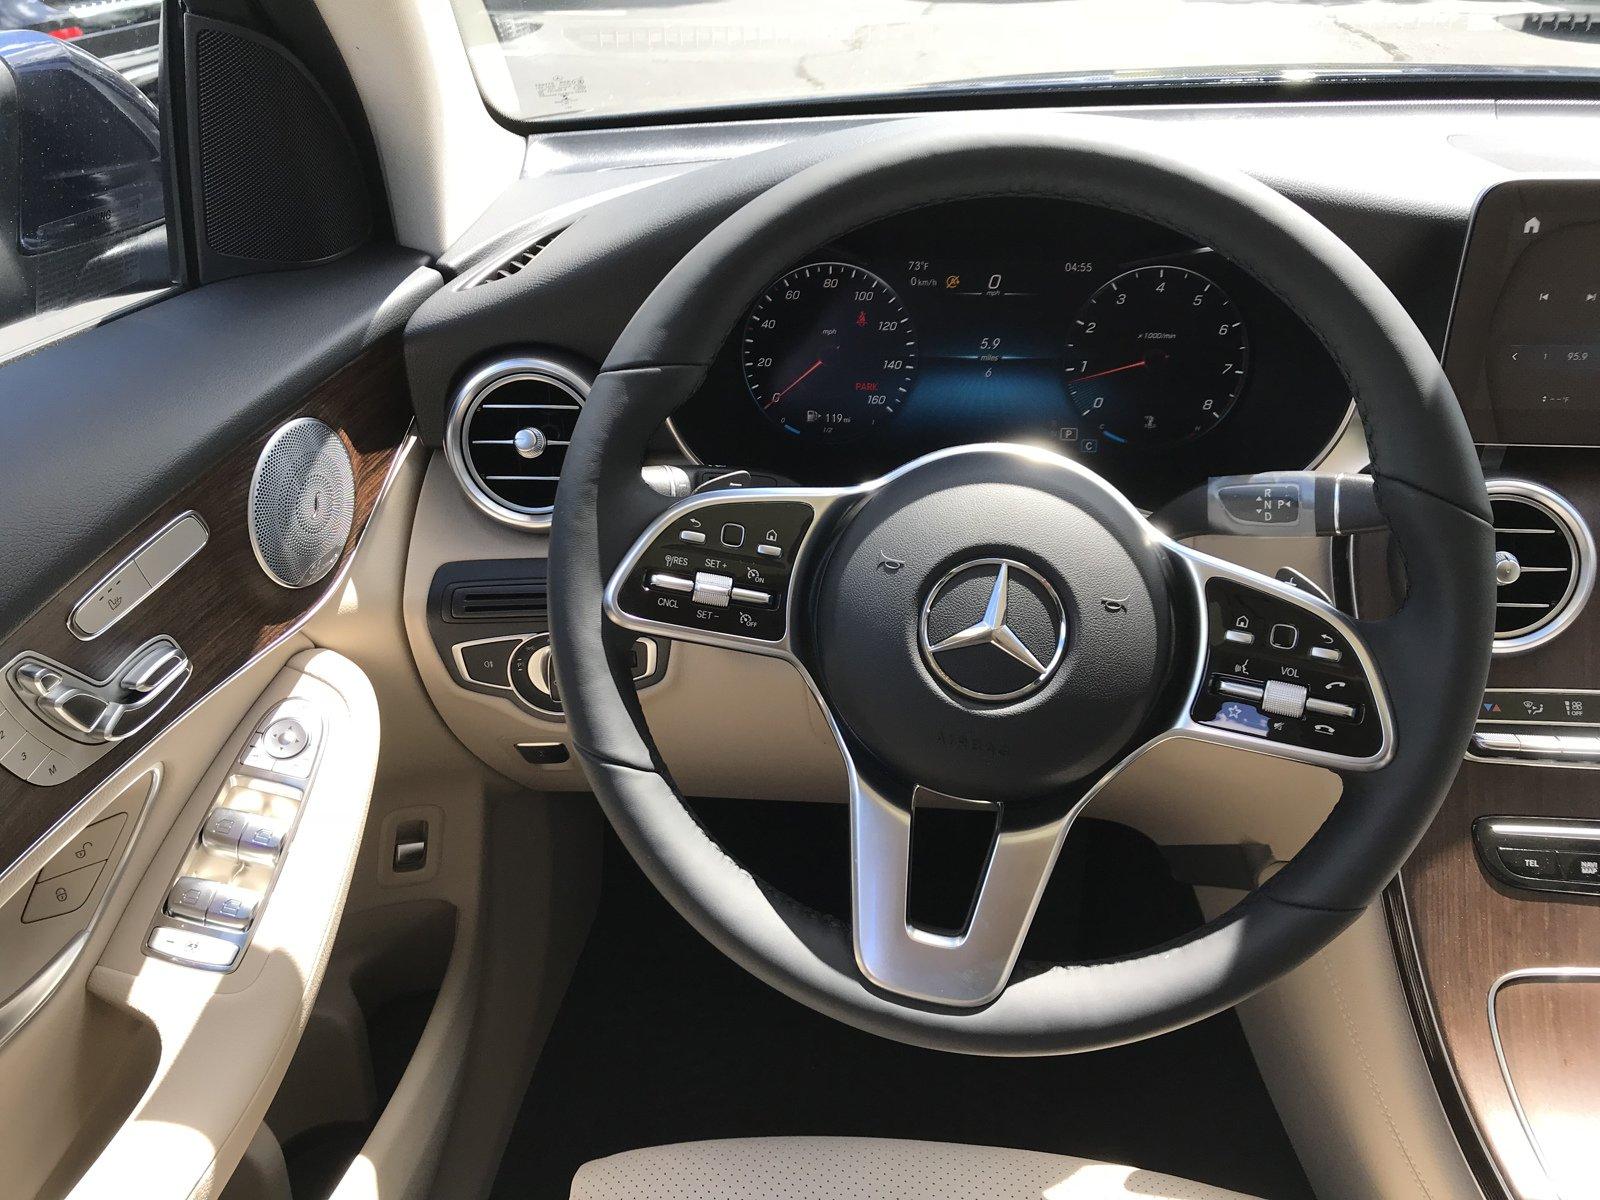 2020 Lunar Blue Metallic Mercedes-Benz GLC | SUVs ...